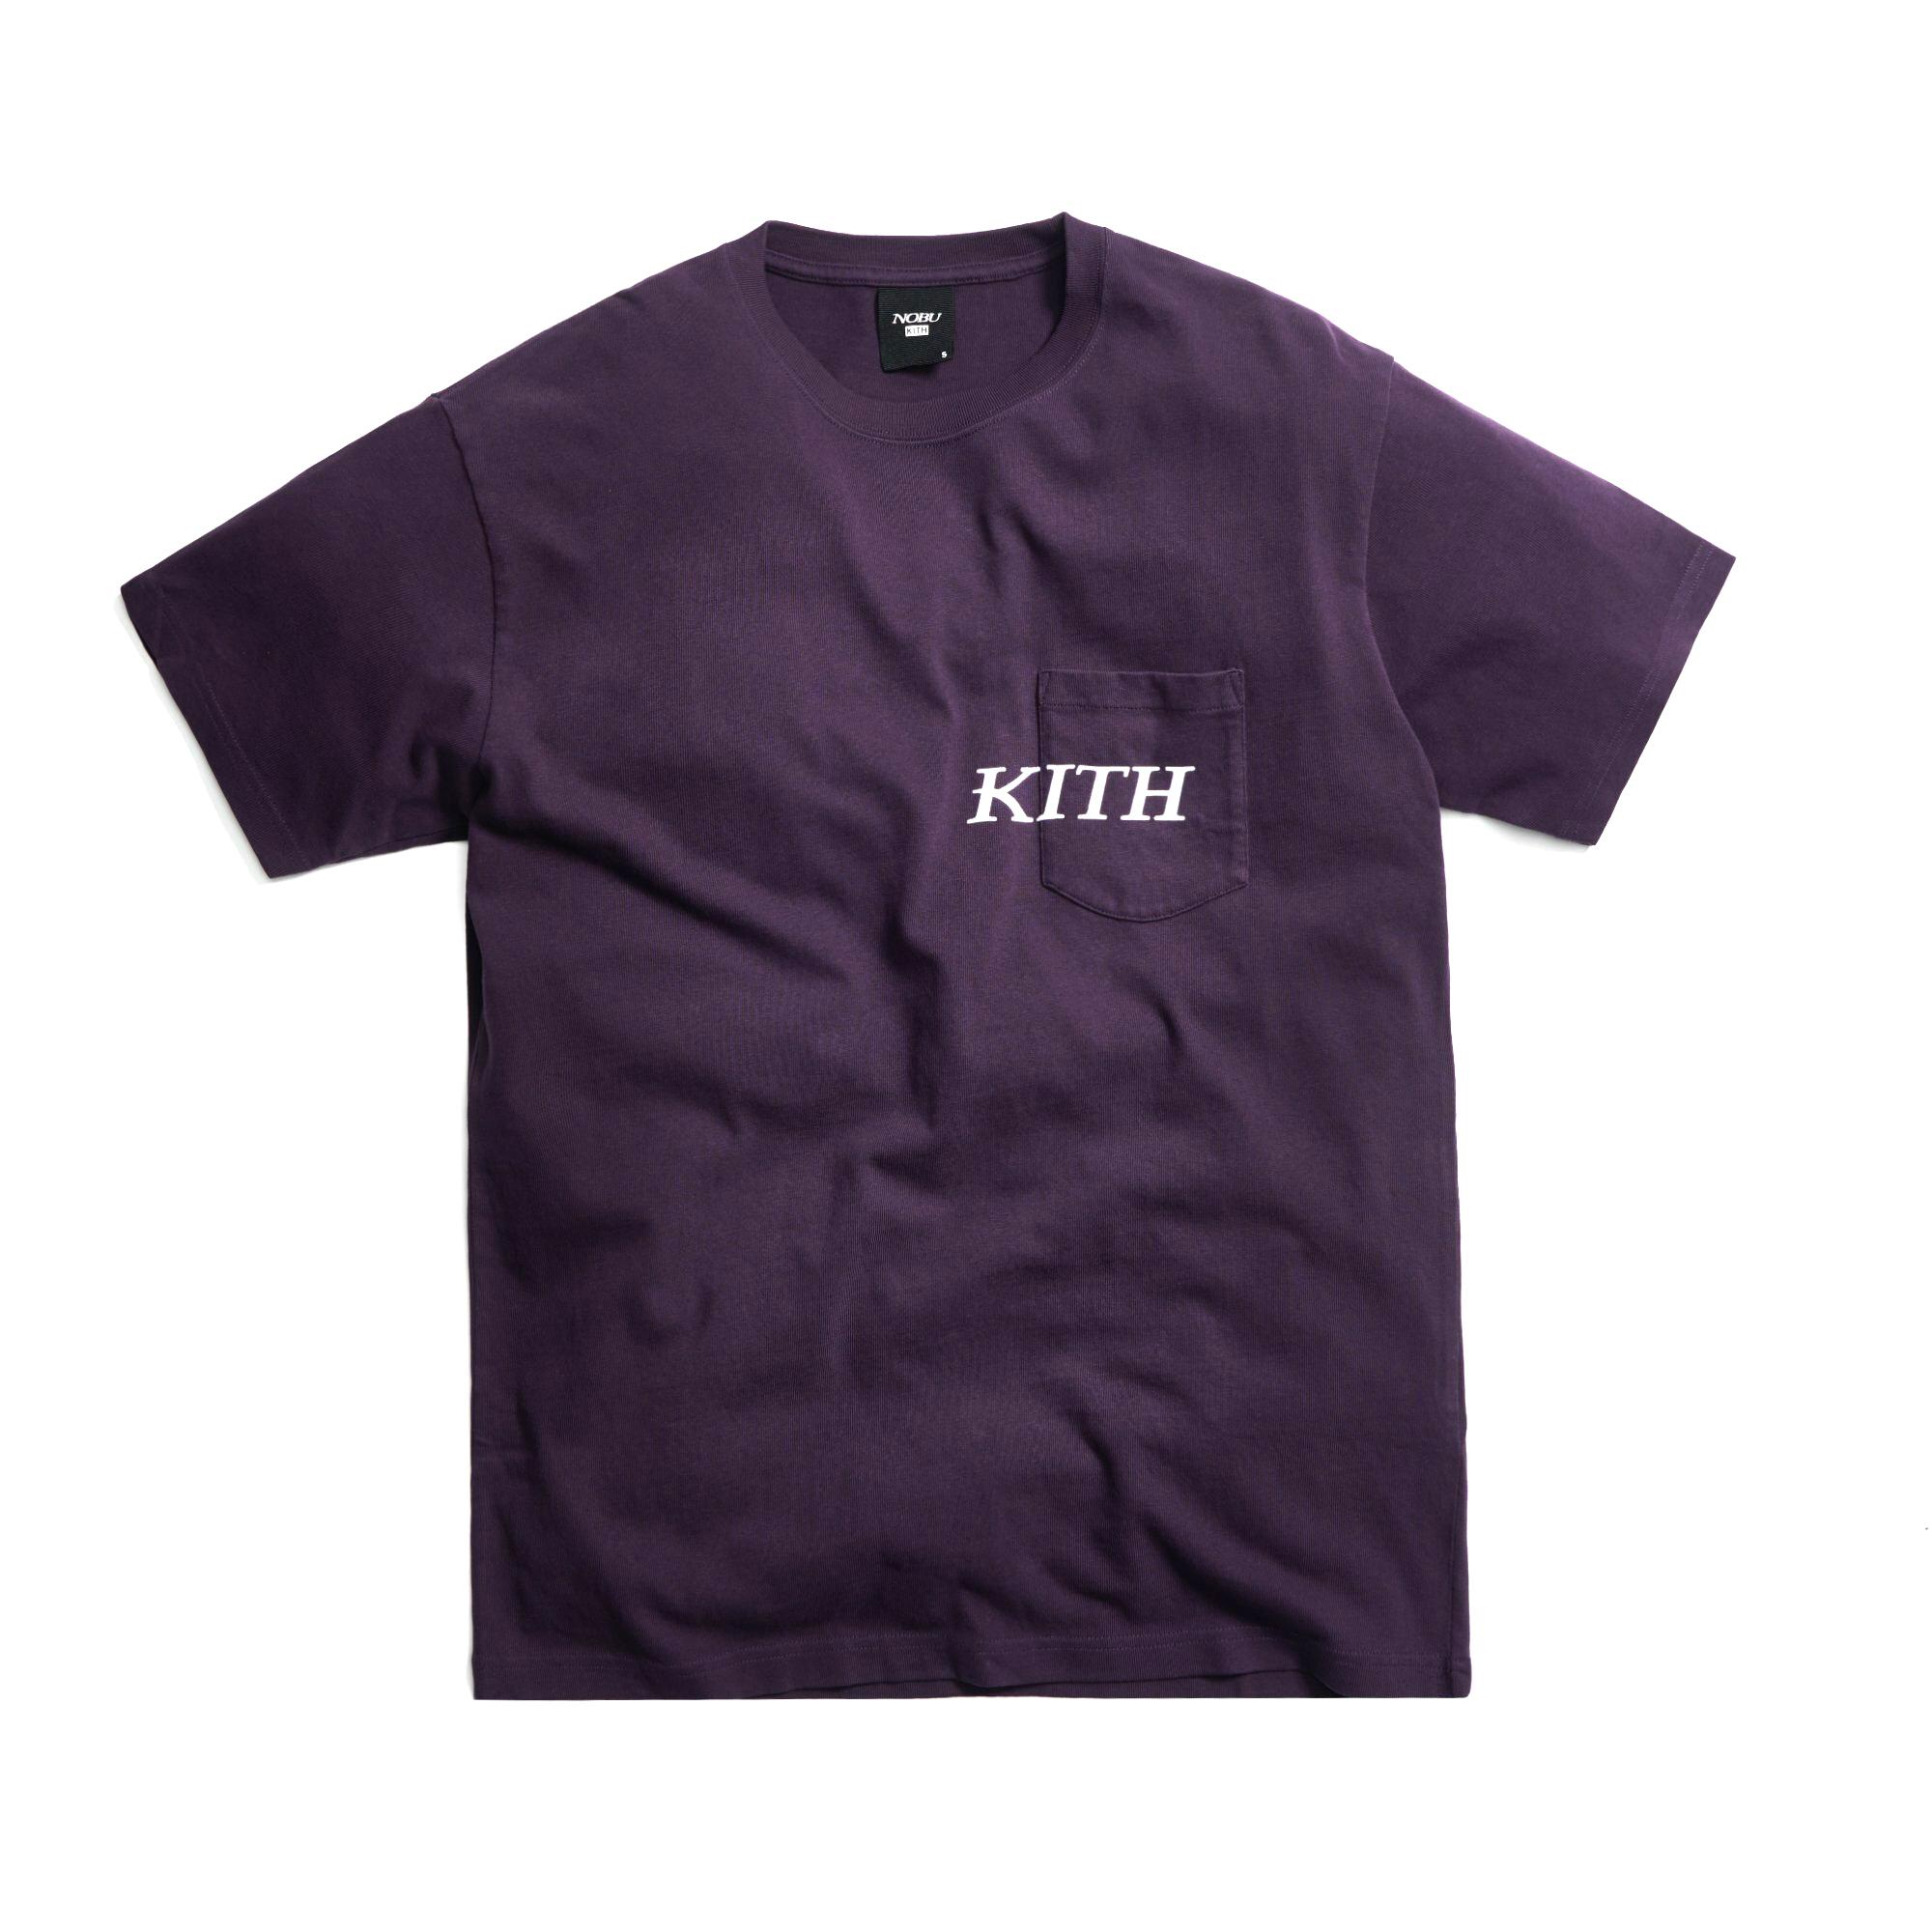 KITH × NOBU Worldwide T-Shirts PURPLE